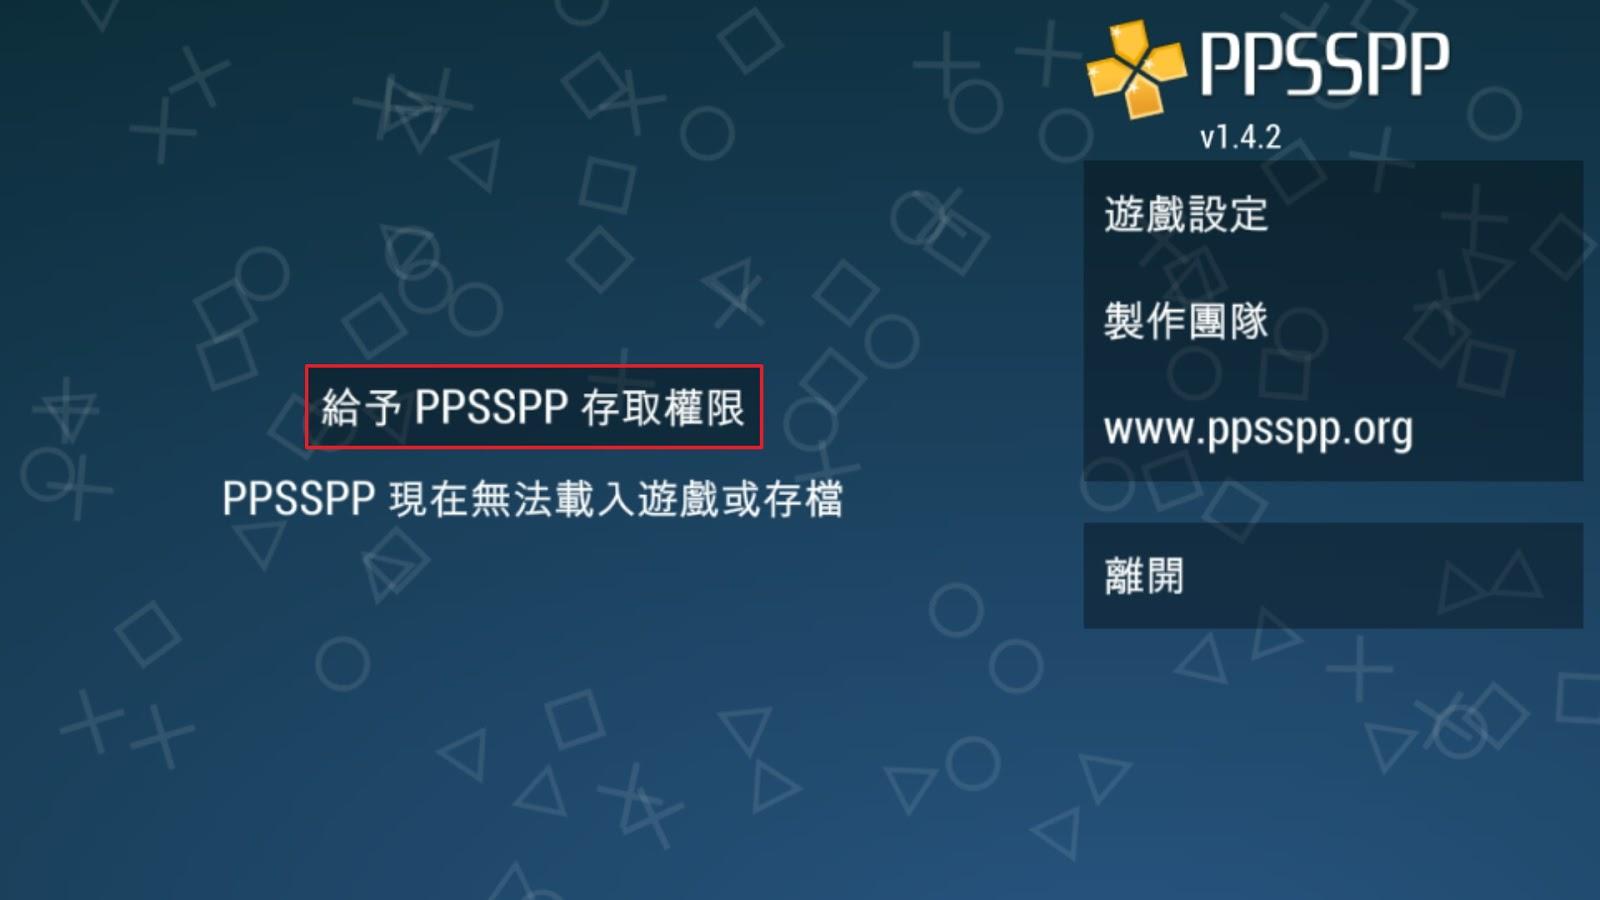 Screenshot 20170624 095819 - 《手機PSP模擬器》PPSSPP Gold v1.4.2.0 在手機上也能玩PSP遊戲!